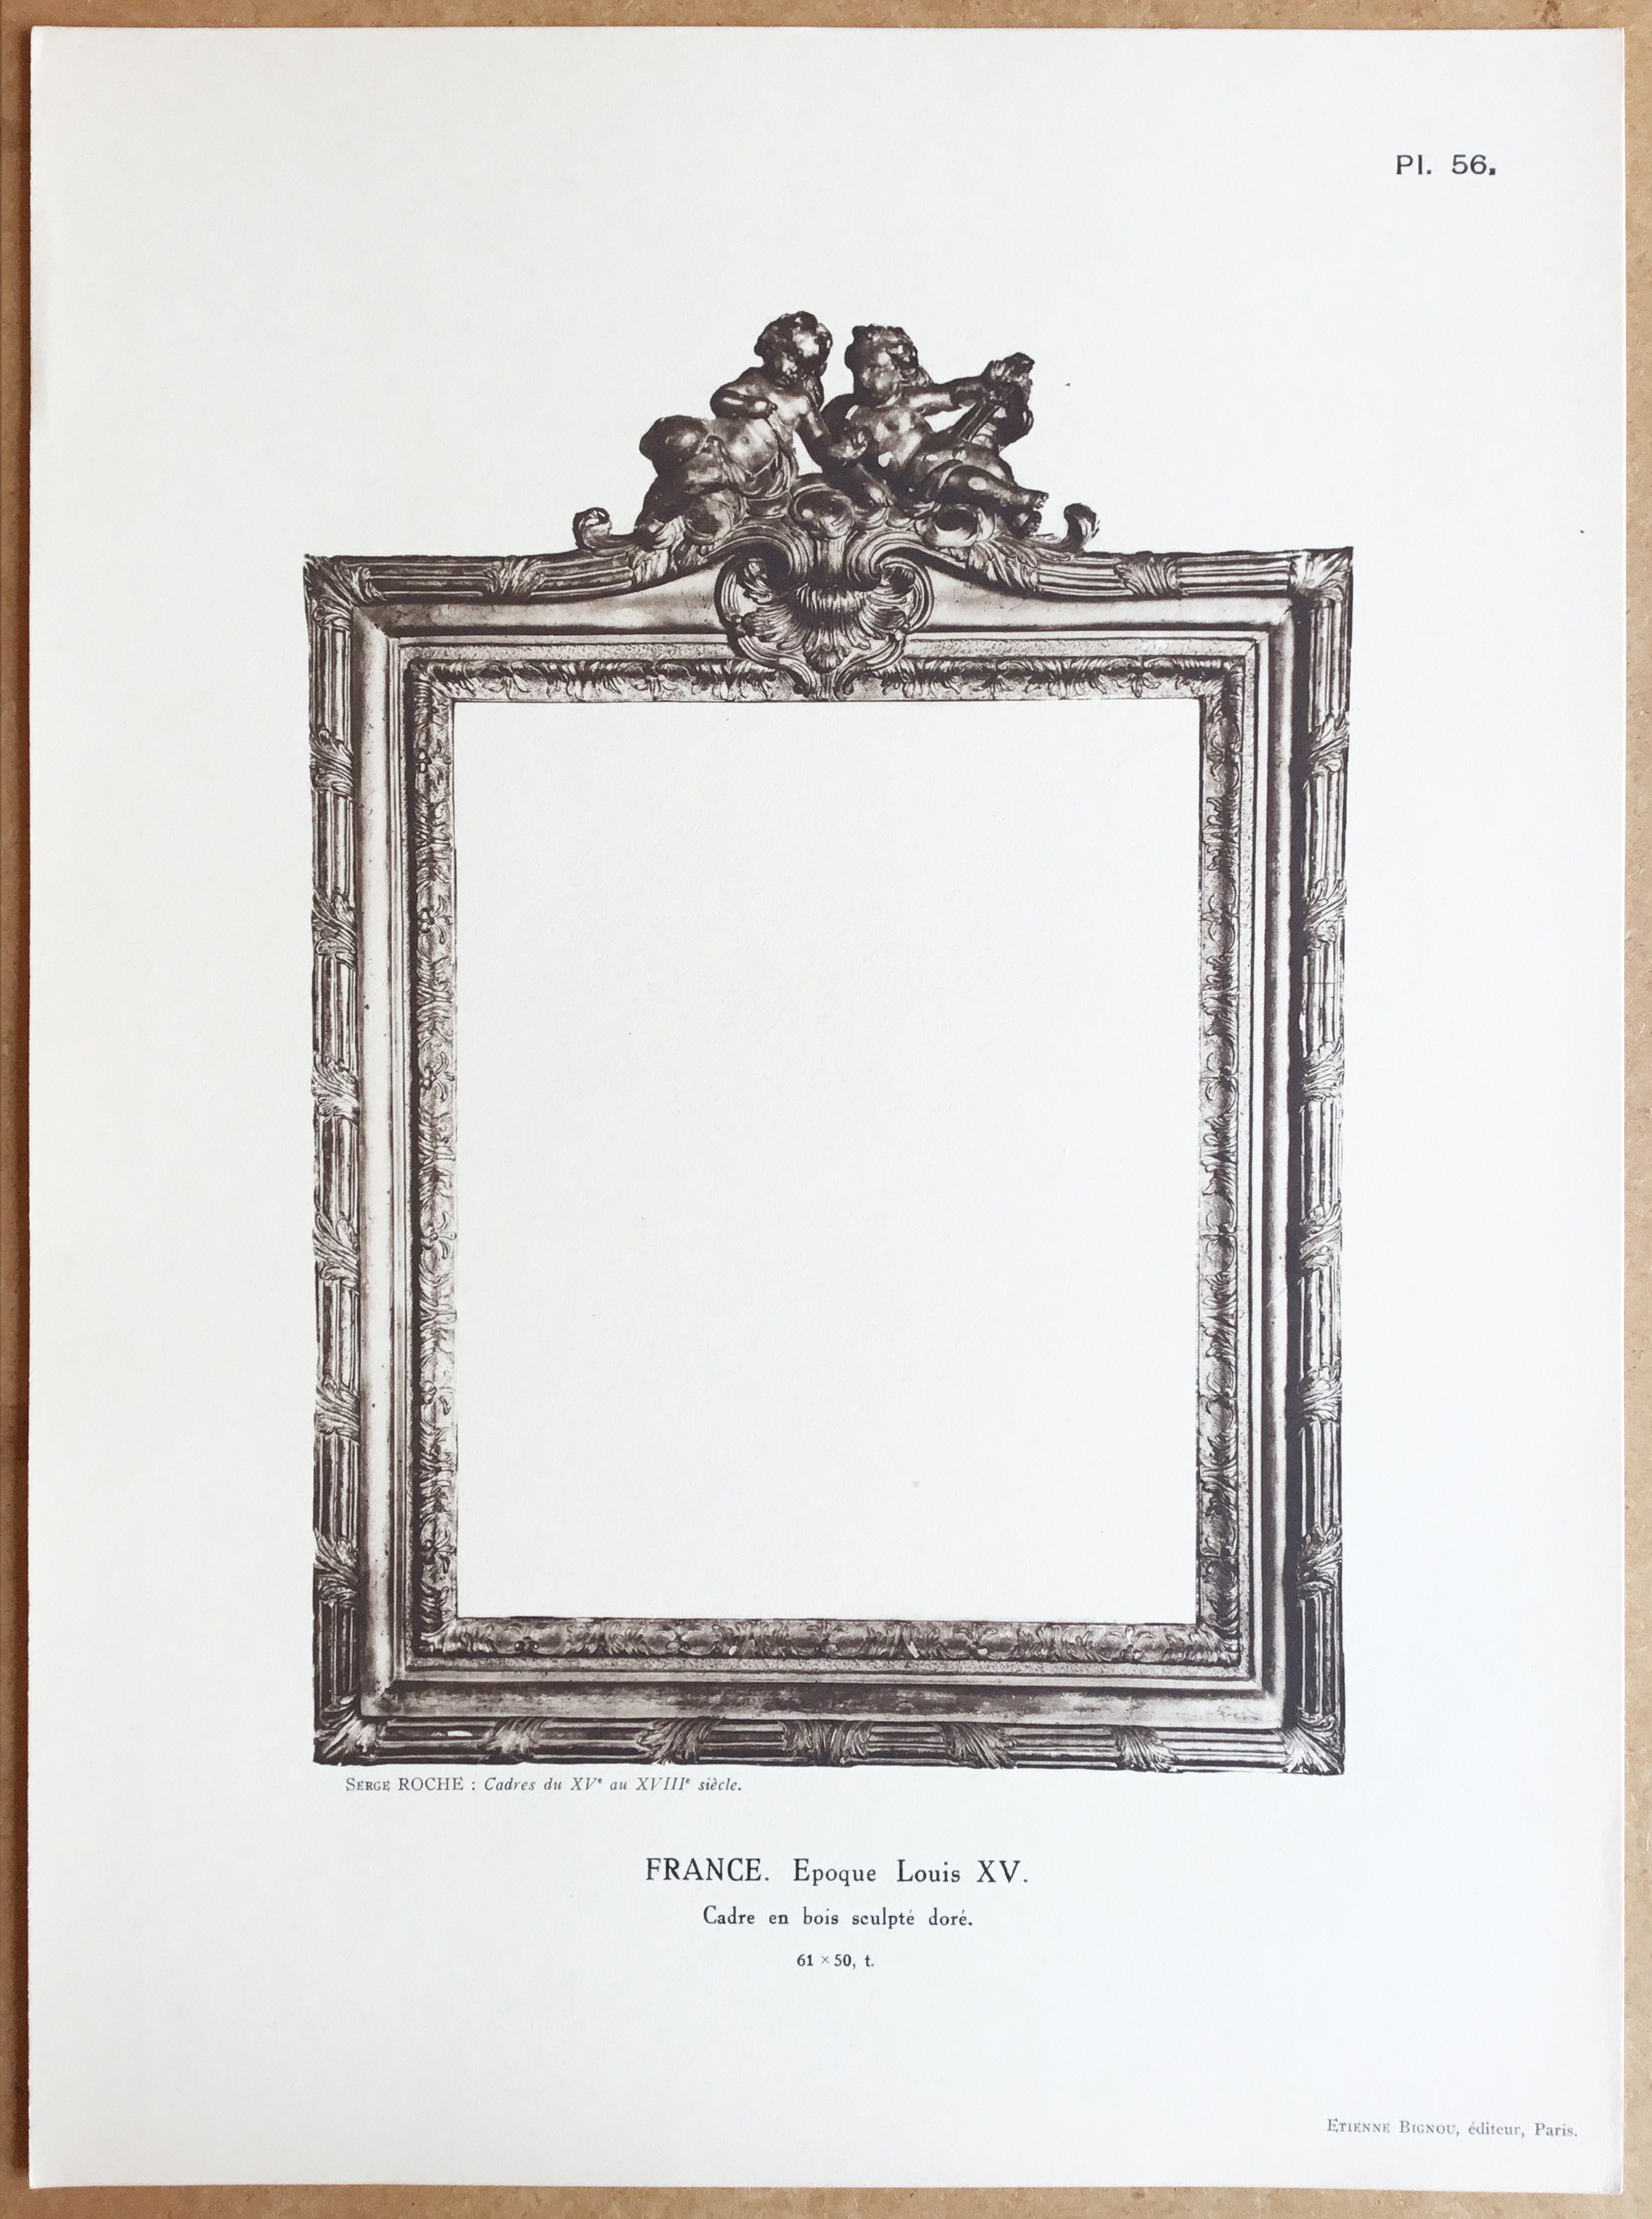 24 Plate 56